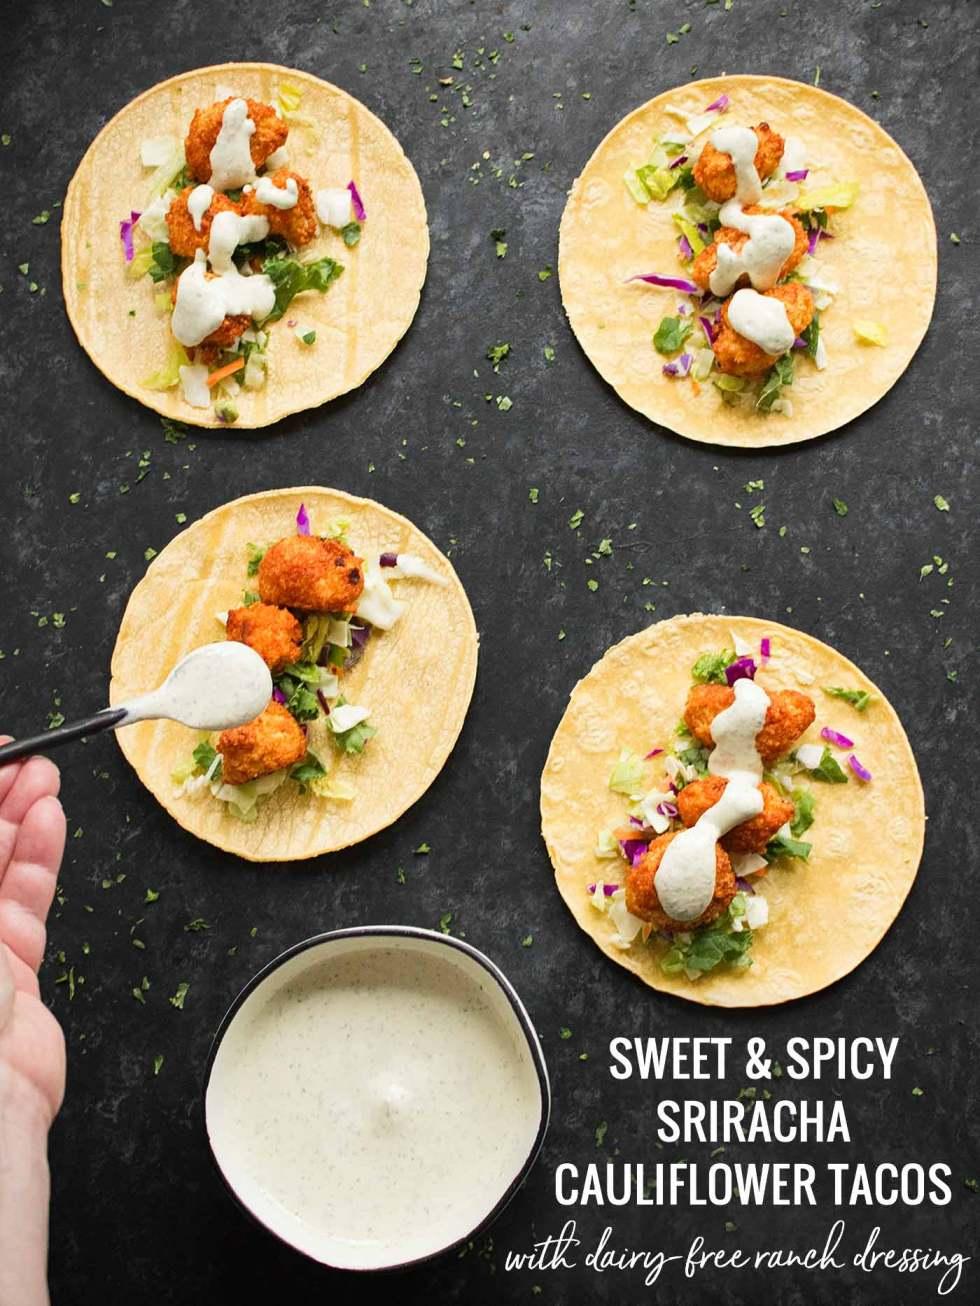 Sweet & Spicy Cauliflower Tacos - Recipe at SoupAddict.com